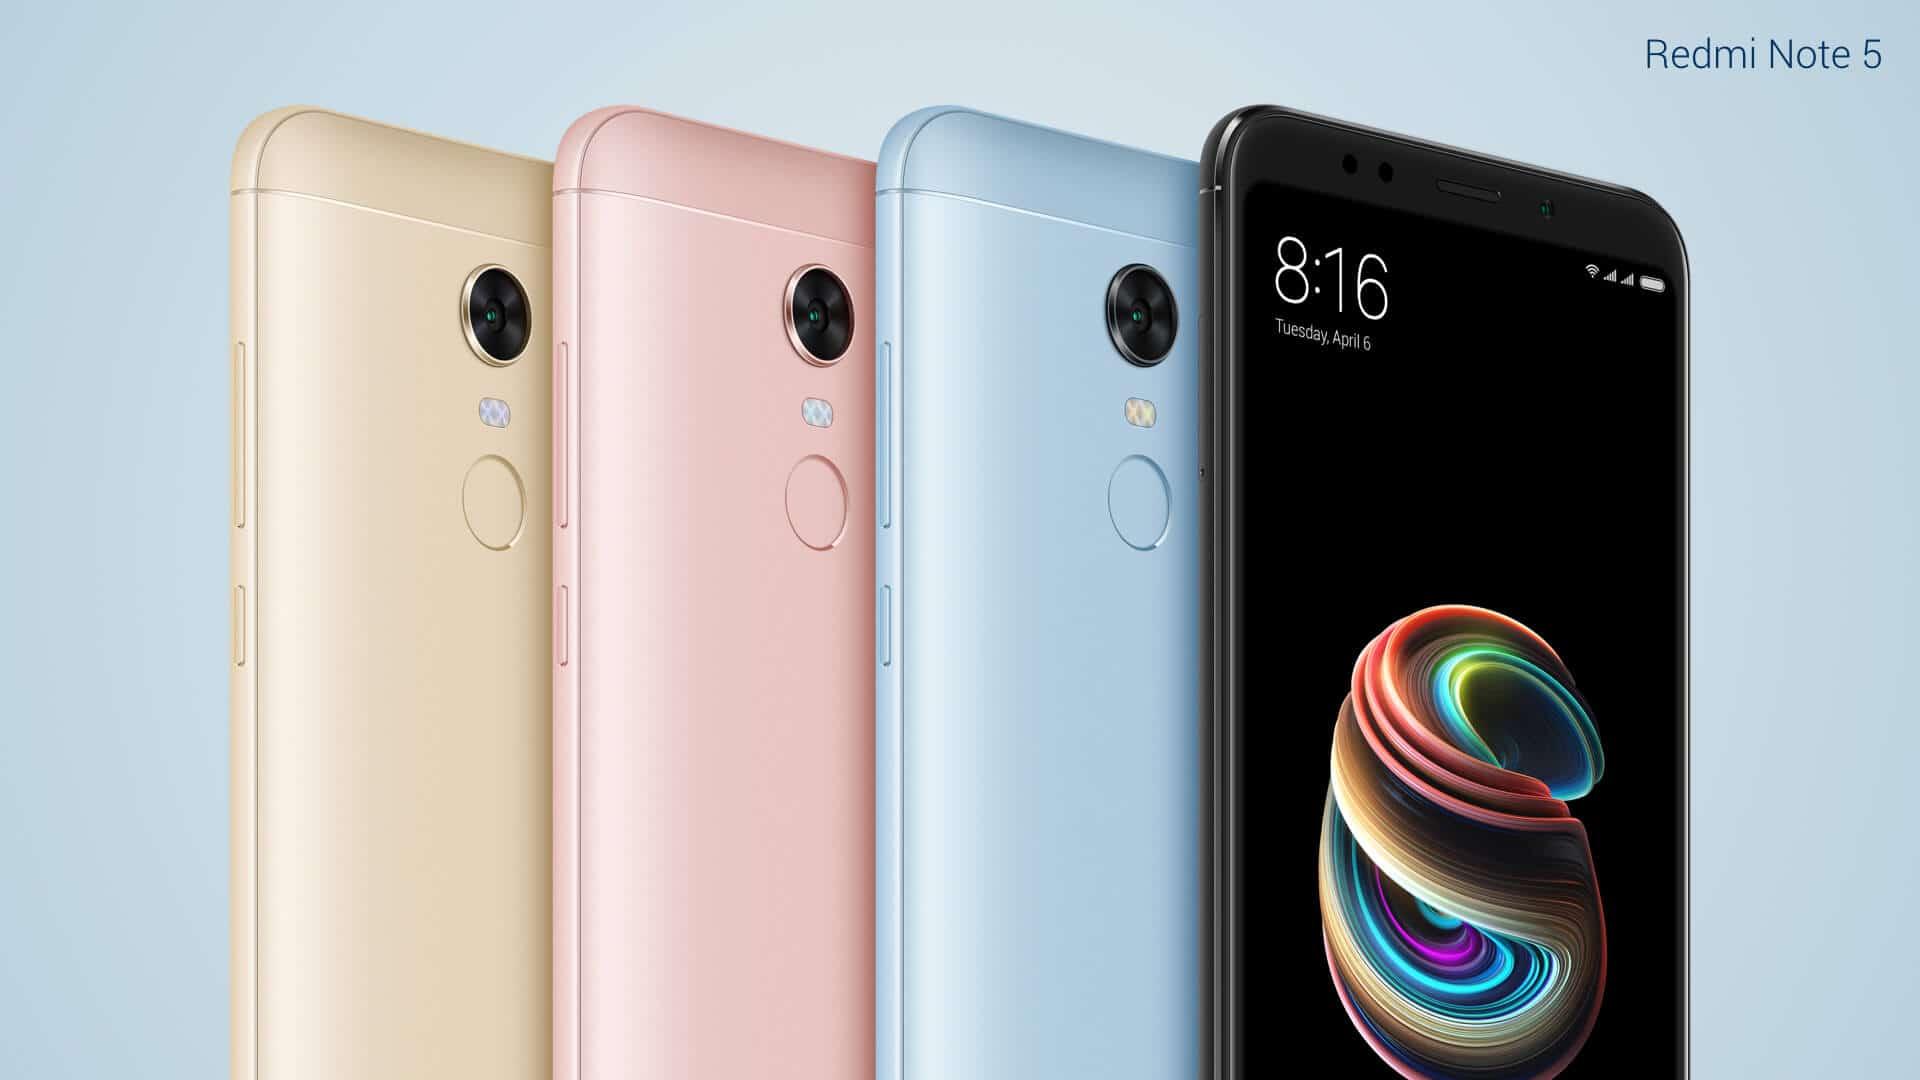 Xiaomi Redmi Note 5 official image 3